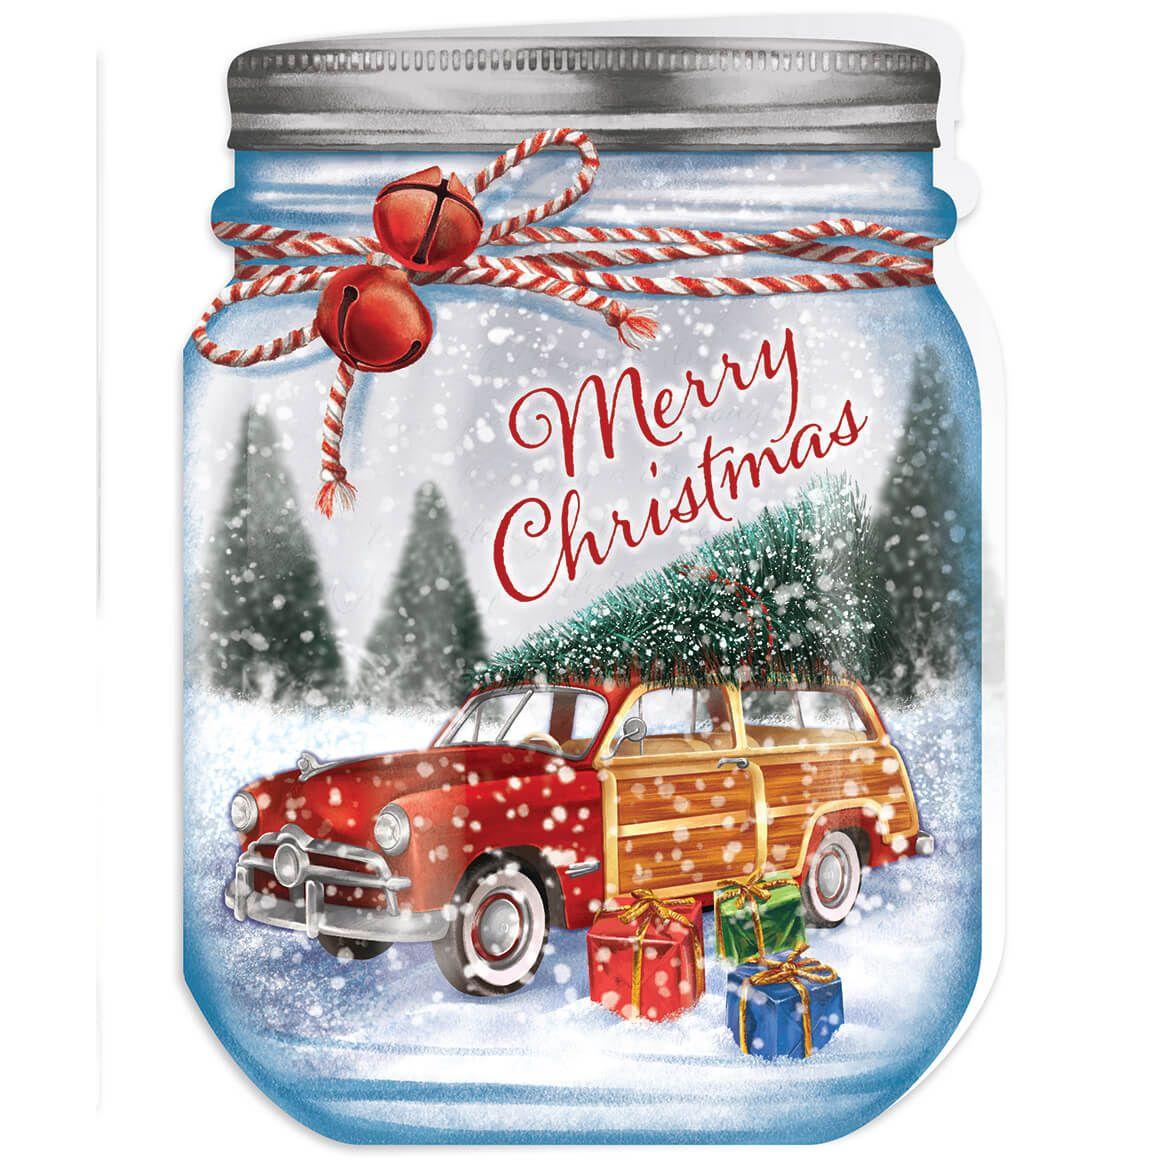 Personalized Merry Mason Jar Christmas Card Set of 20-368226